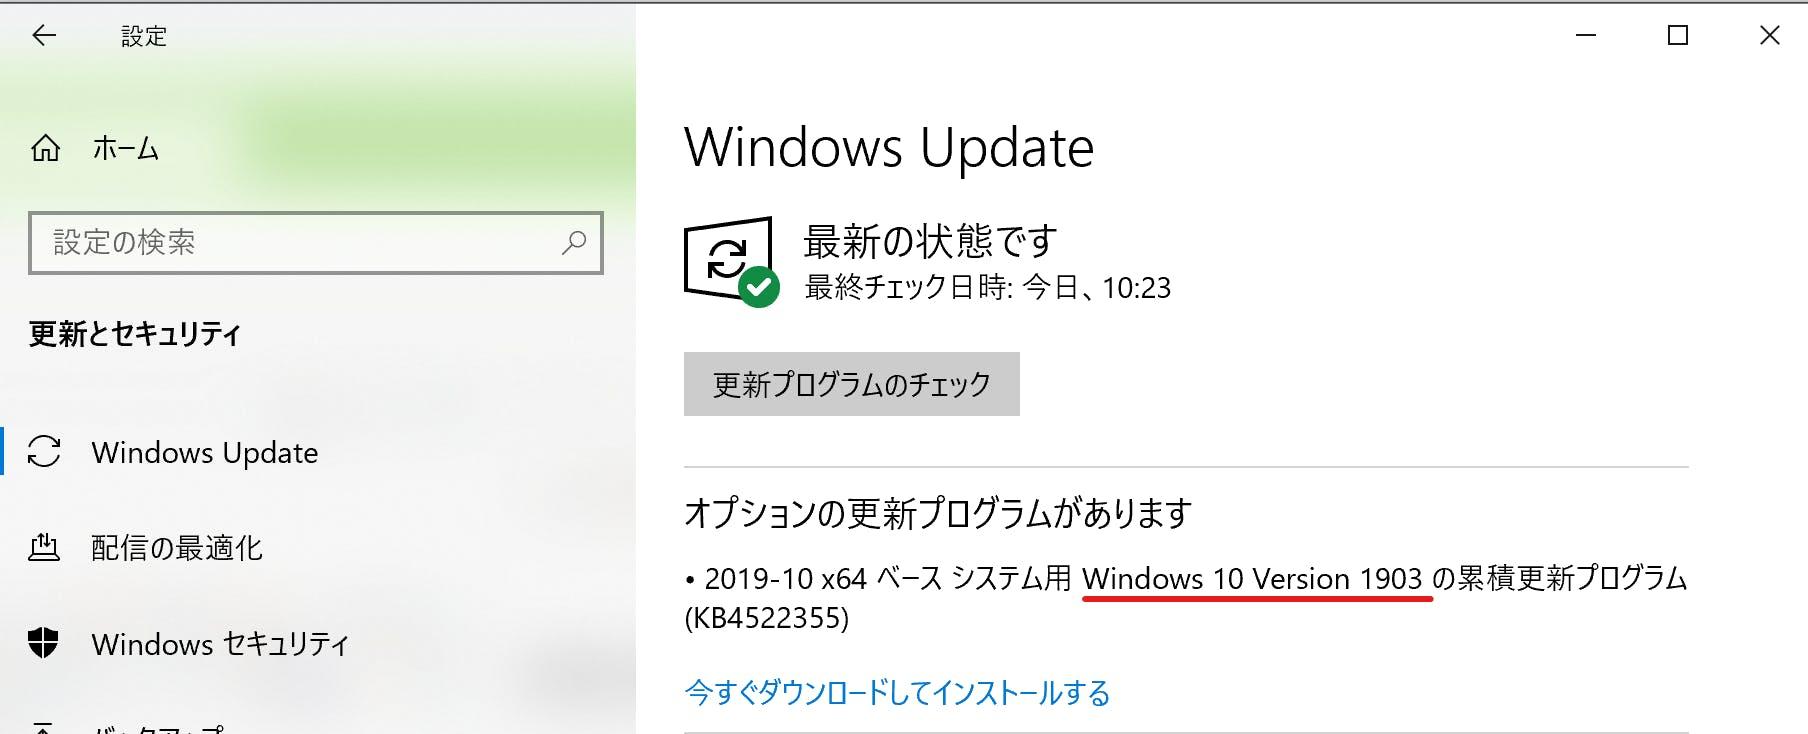 windows10-version.png